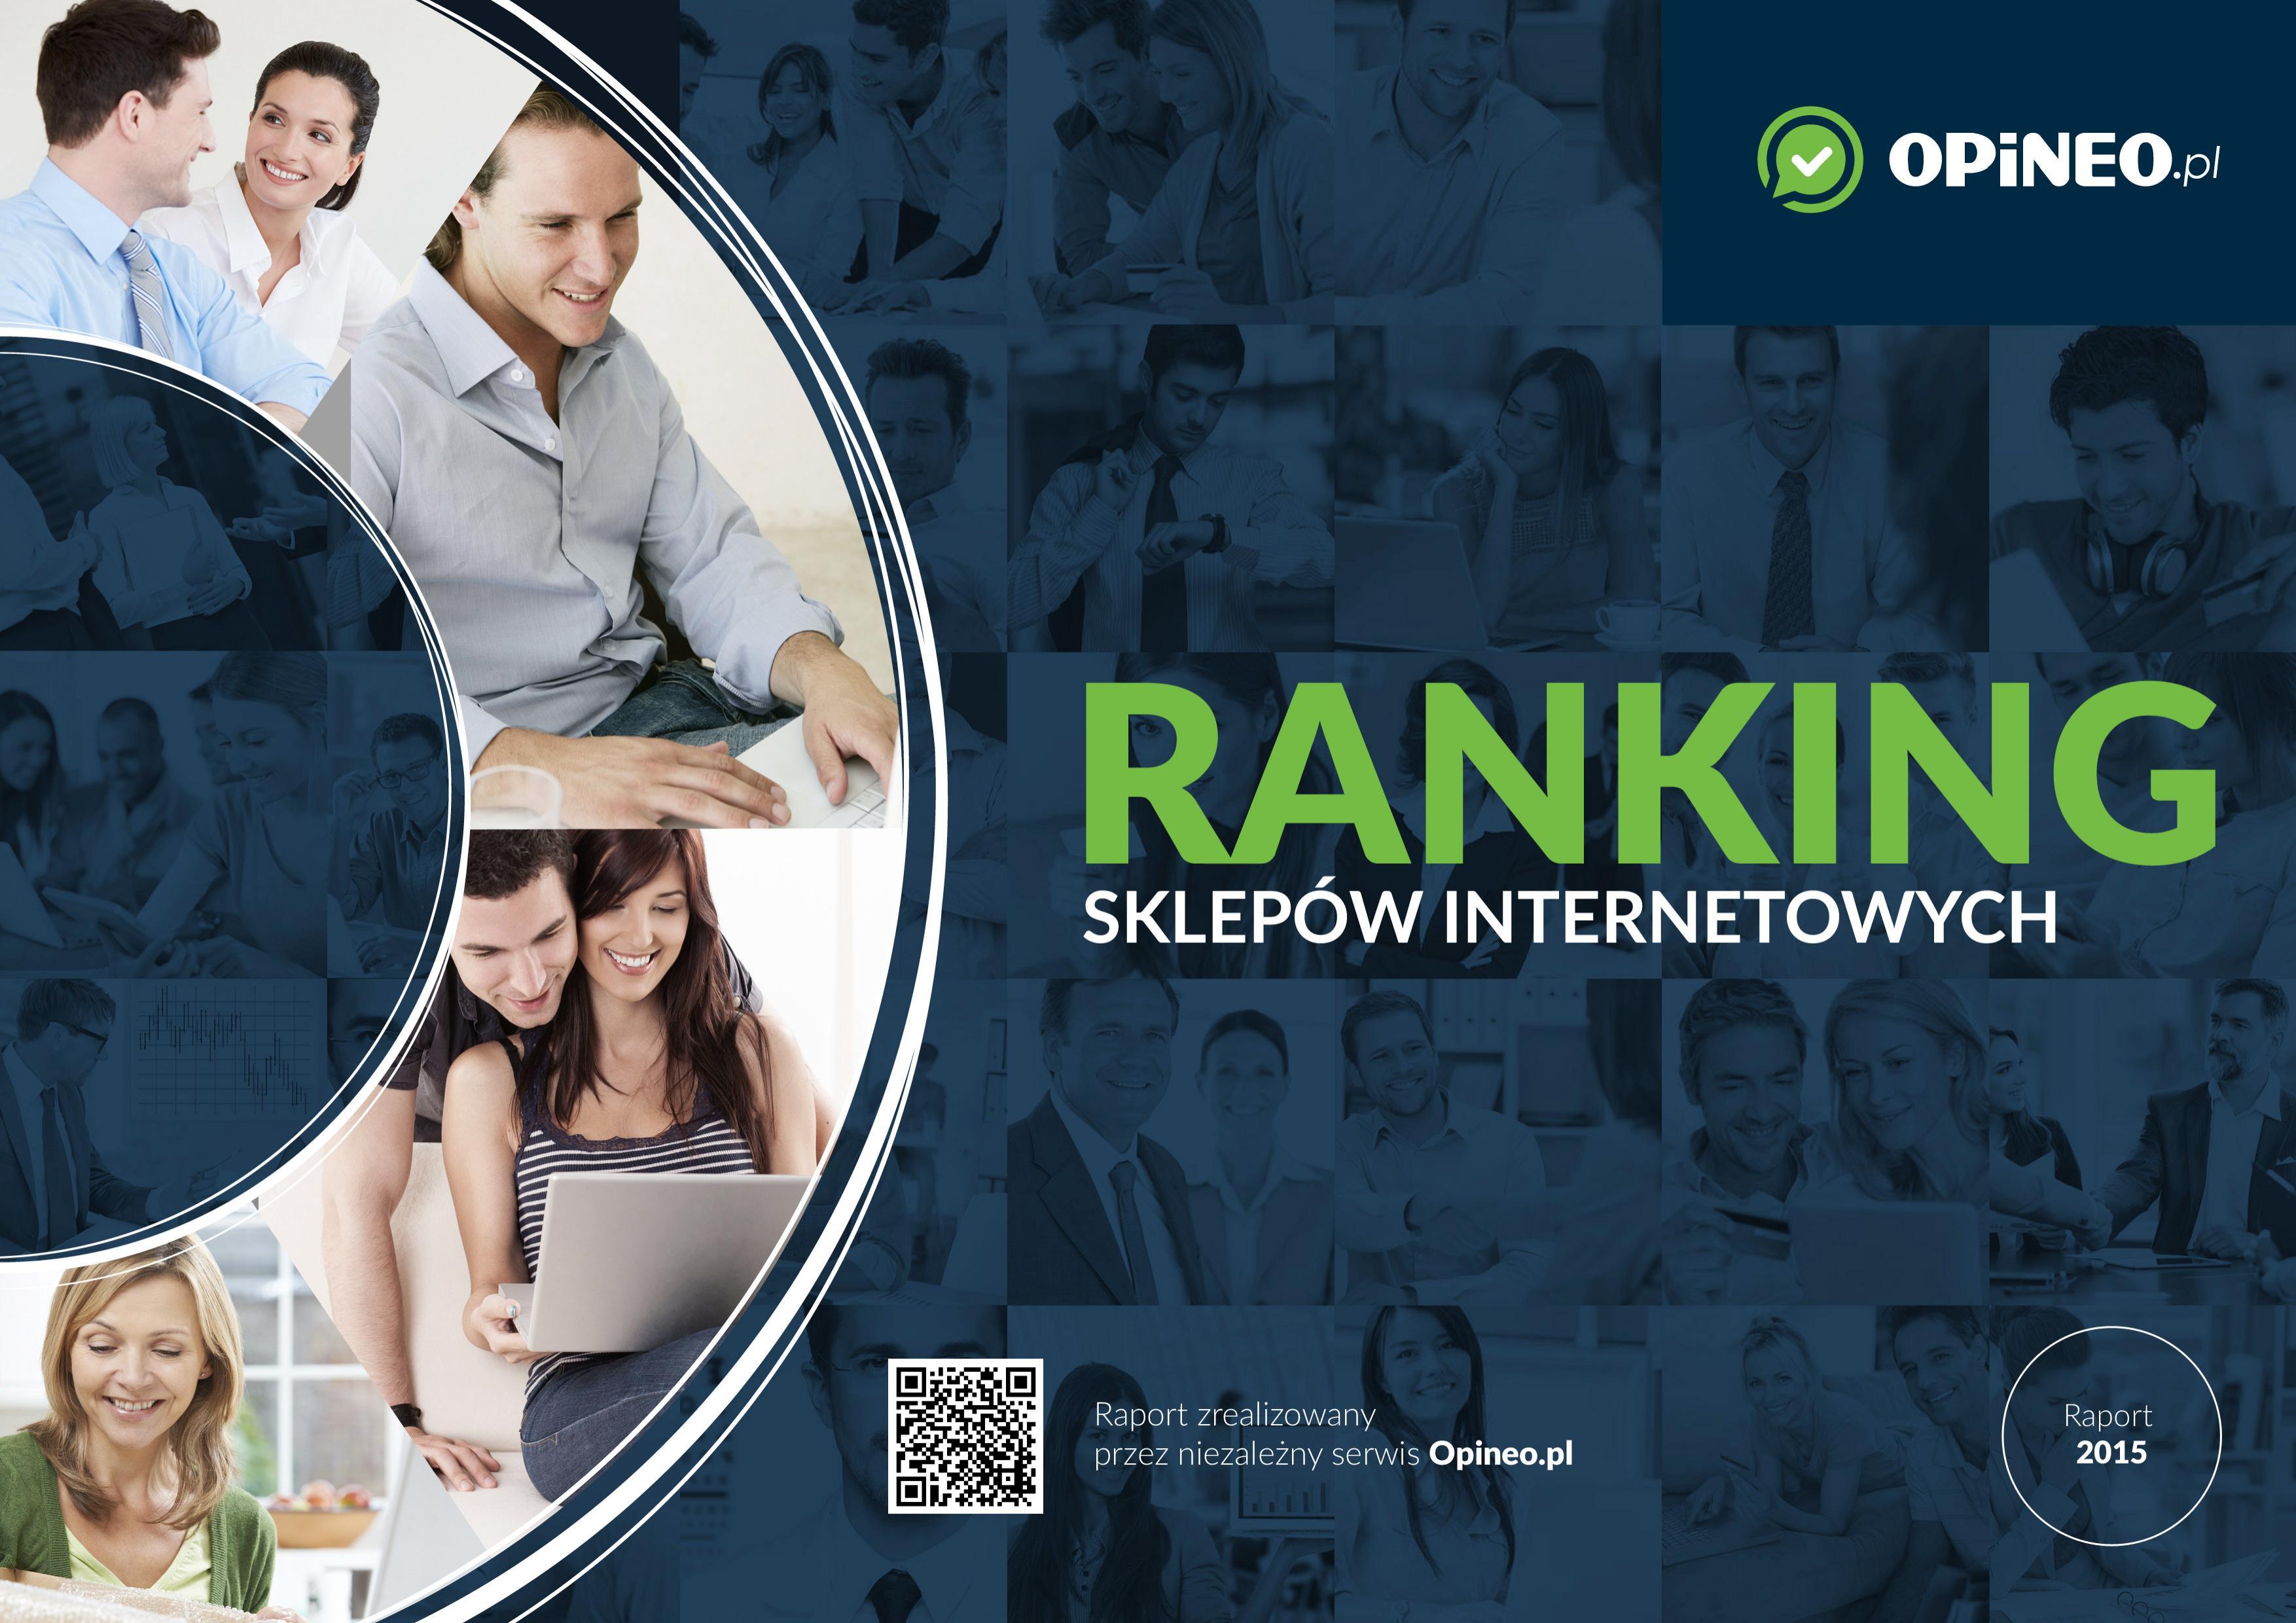 Ranking e-sklepów: Morele numerem 1